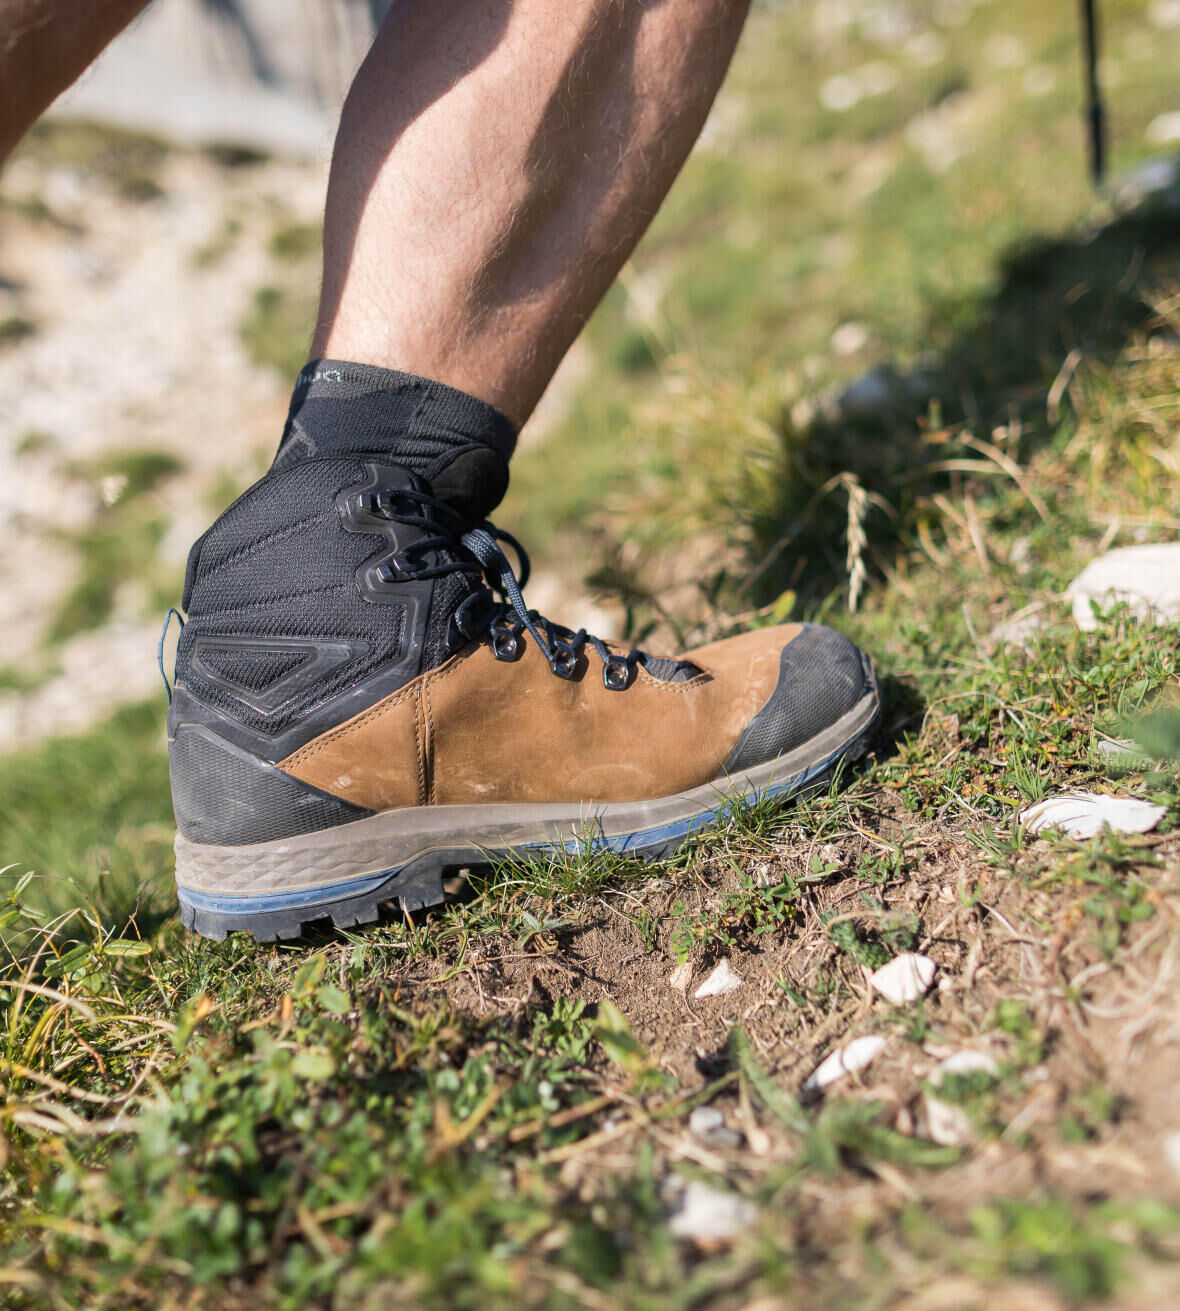 how-to-choose-hiking-trekking-footwear-duration-walk-durability-resistance